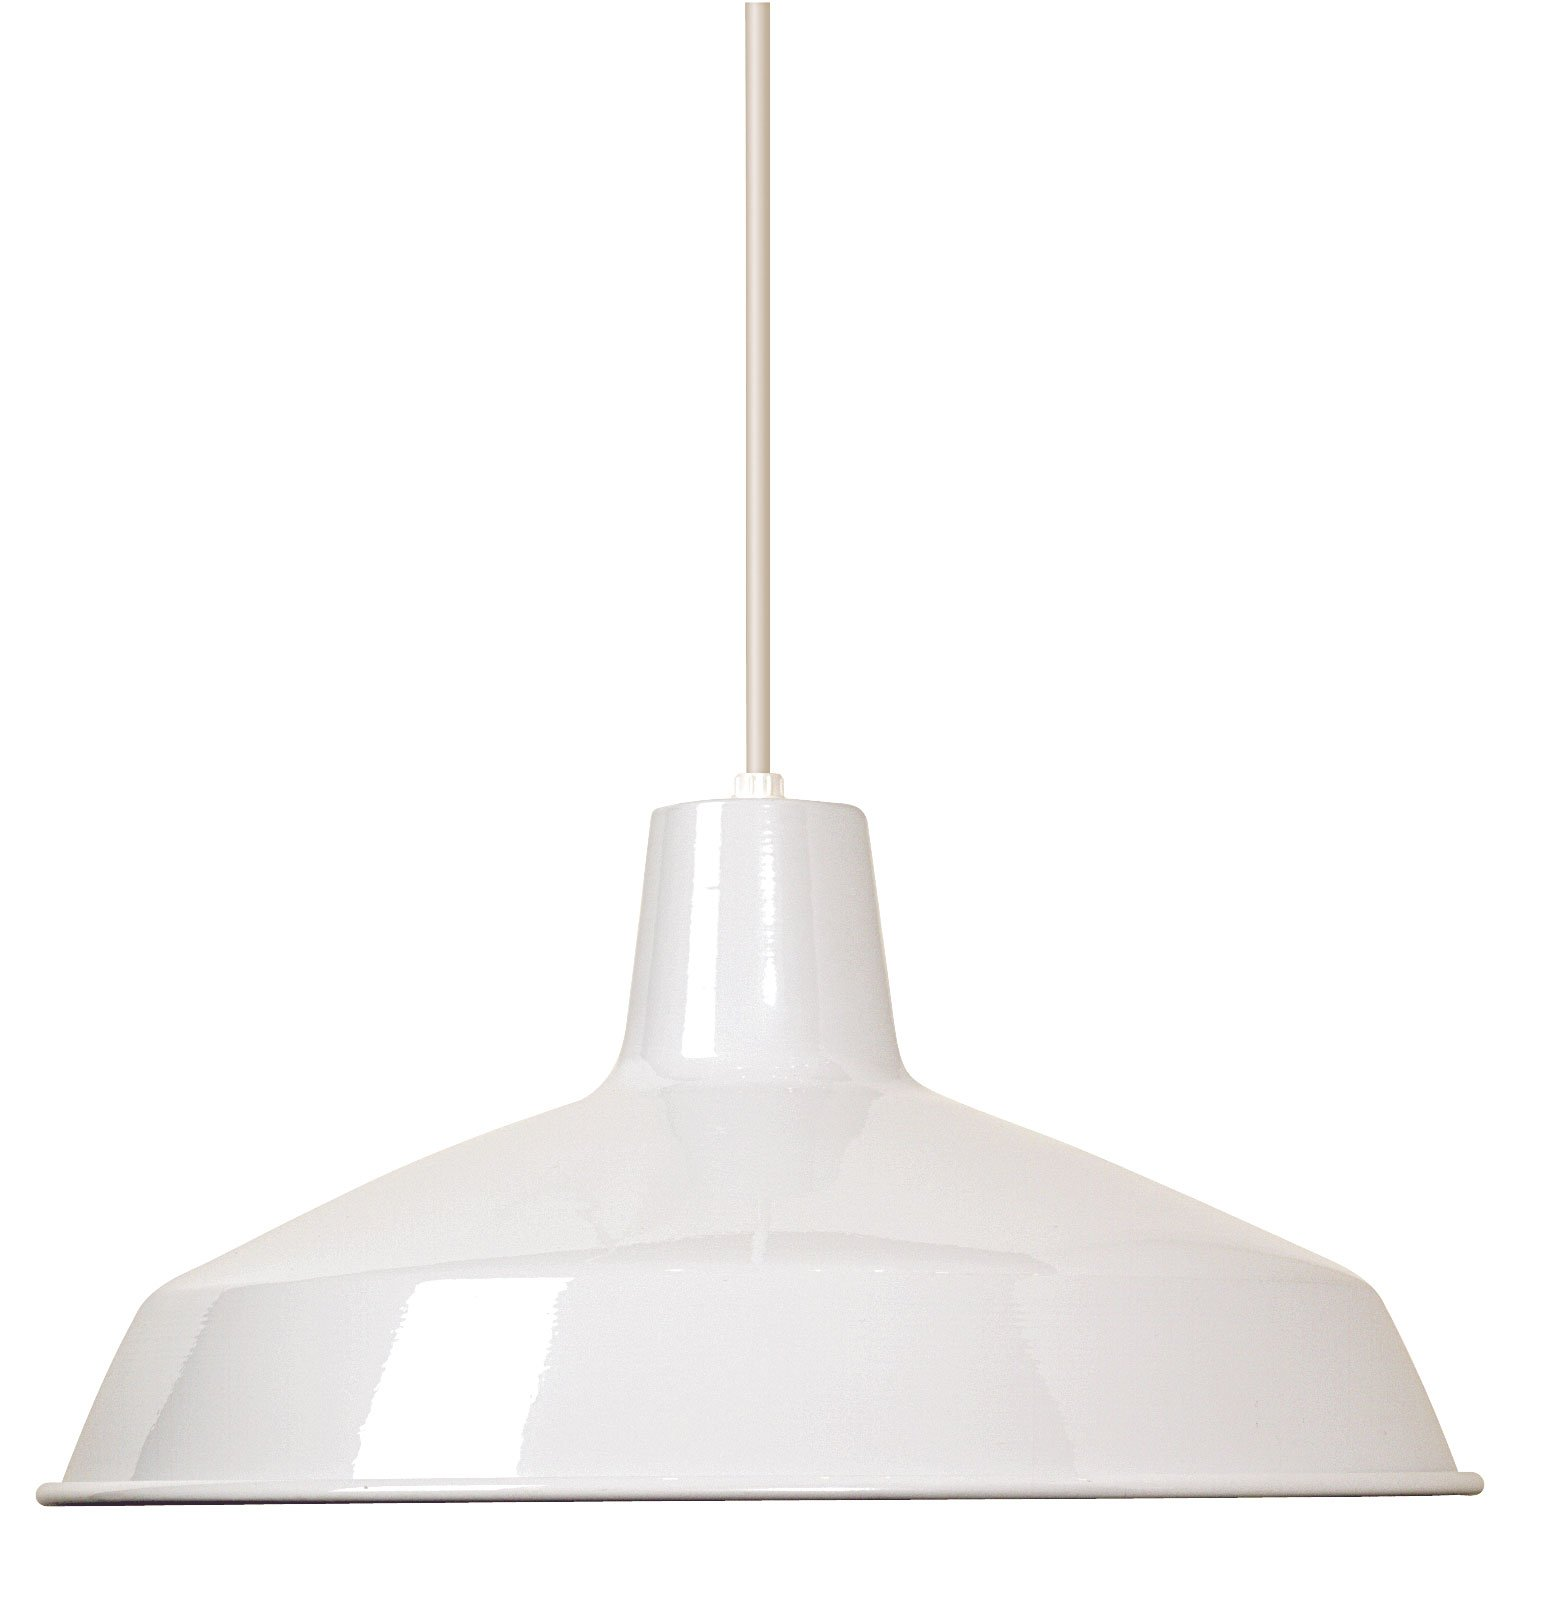 Nuvo Lighting SF76/283 Warehouse Shade, White